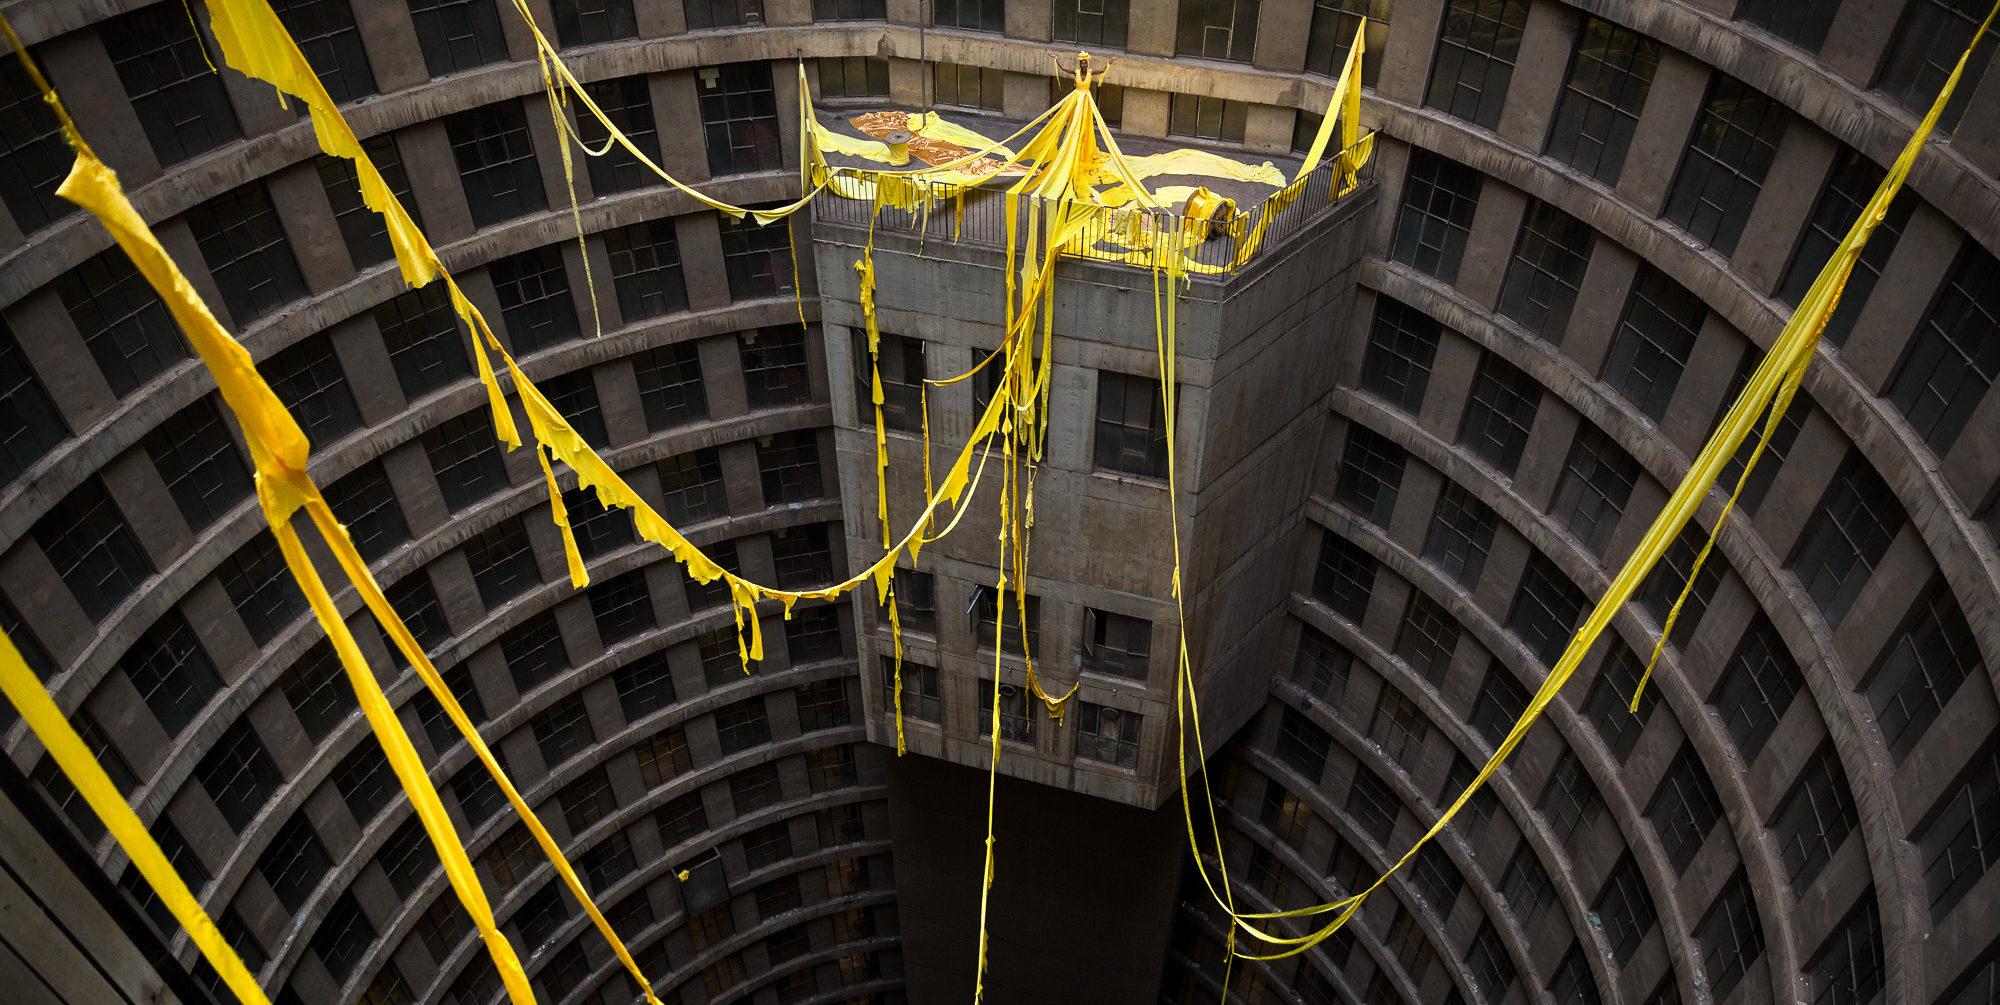 Spiral of containment photo essay Elisa Iannacone